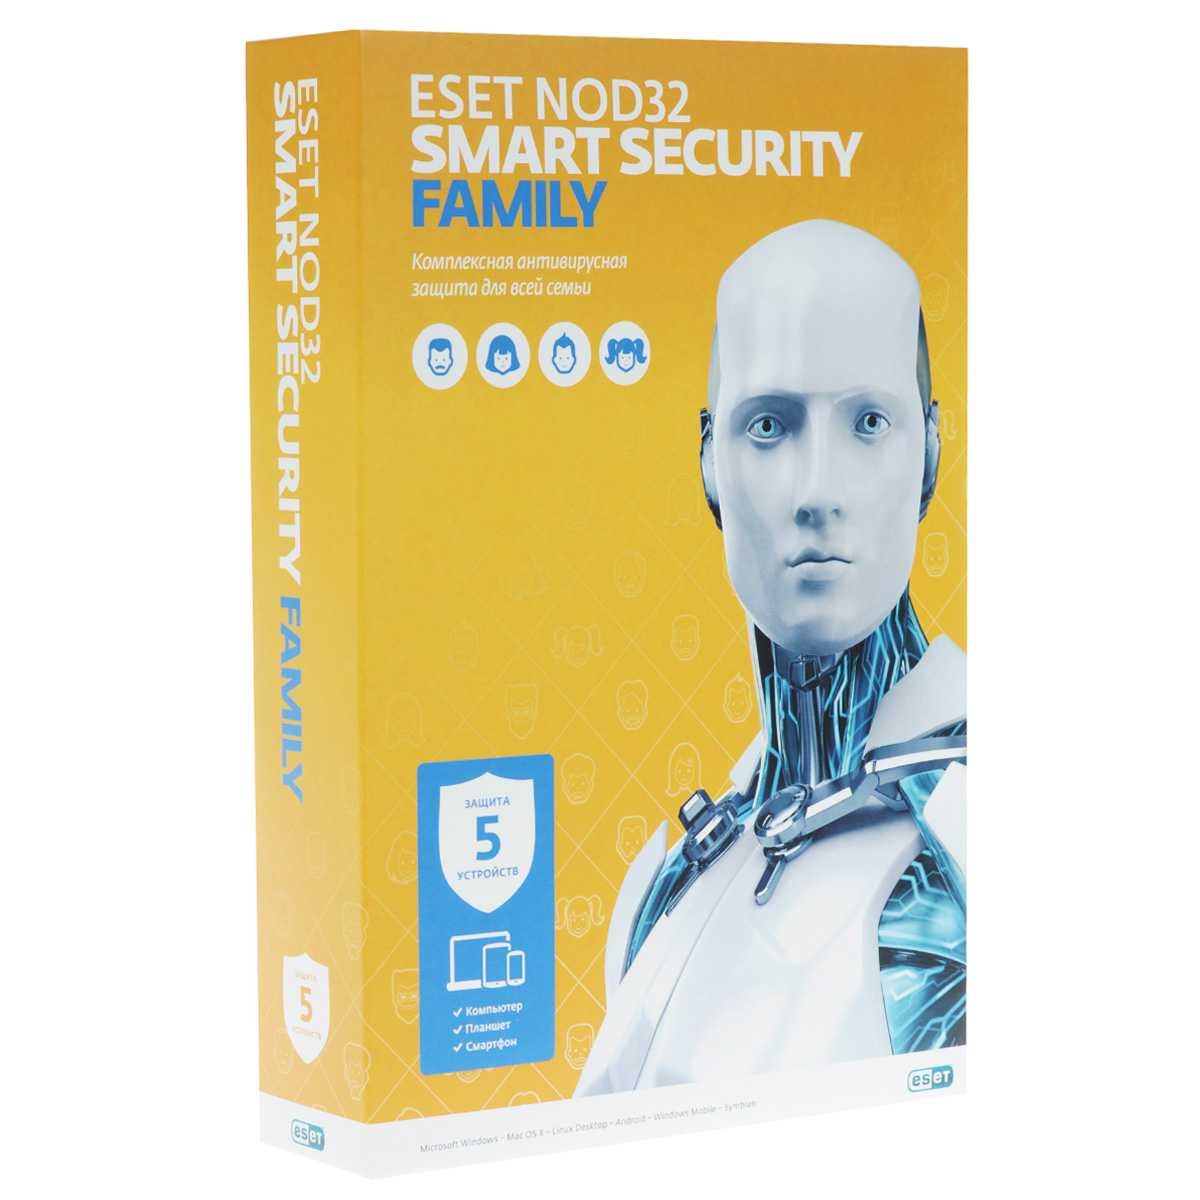 ESET NOD32 Smart Security Family. Лицензия на 1 год на 5 устройств